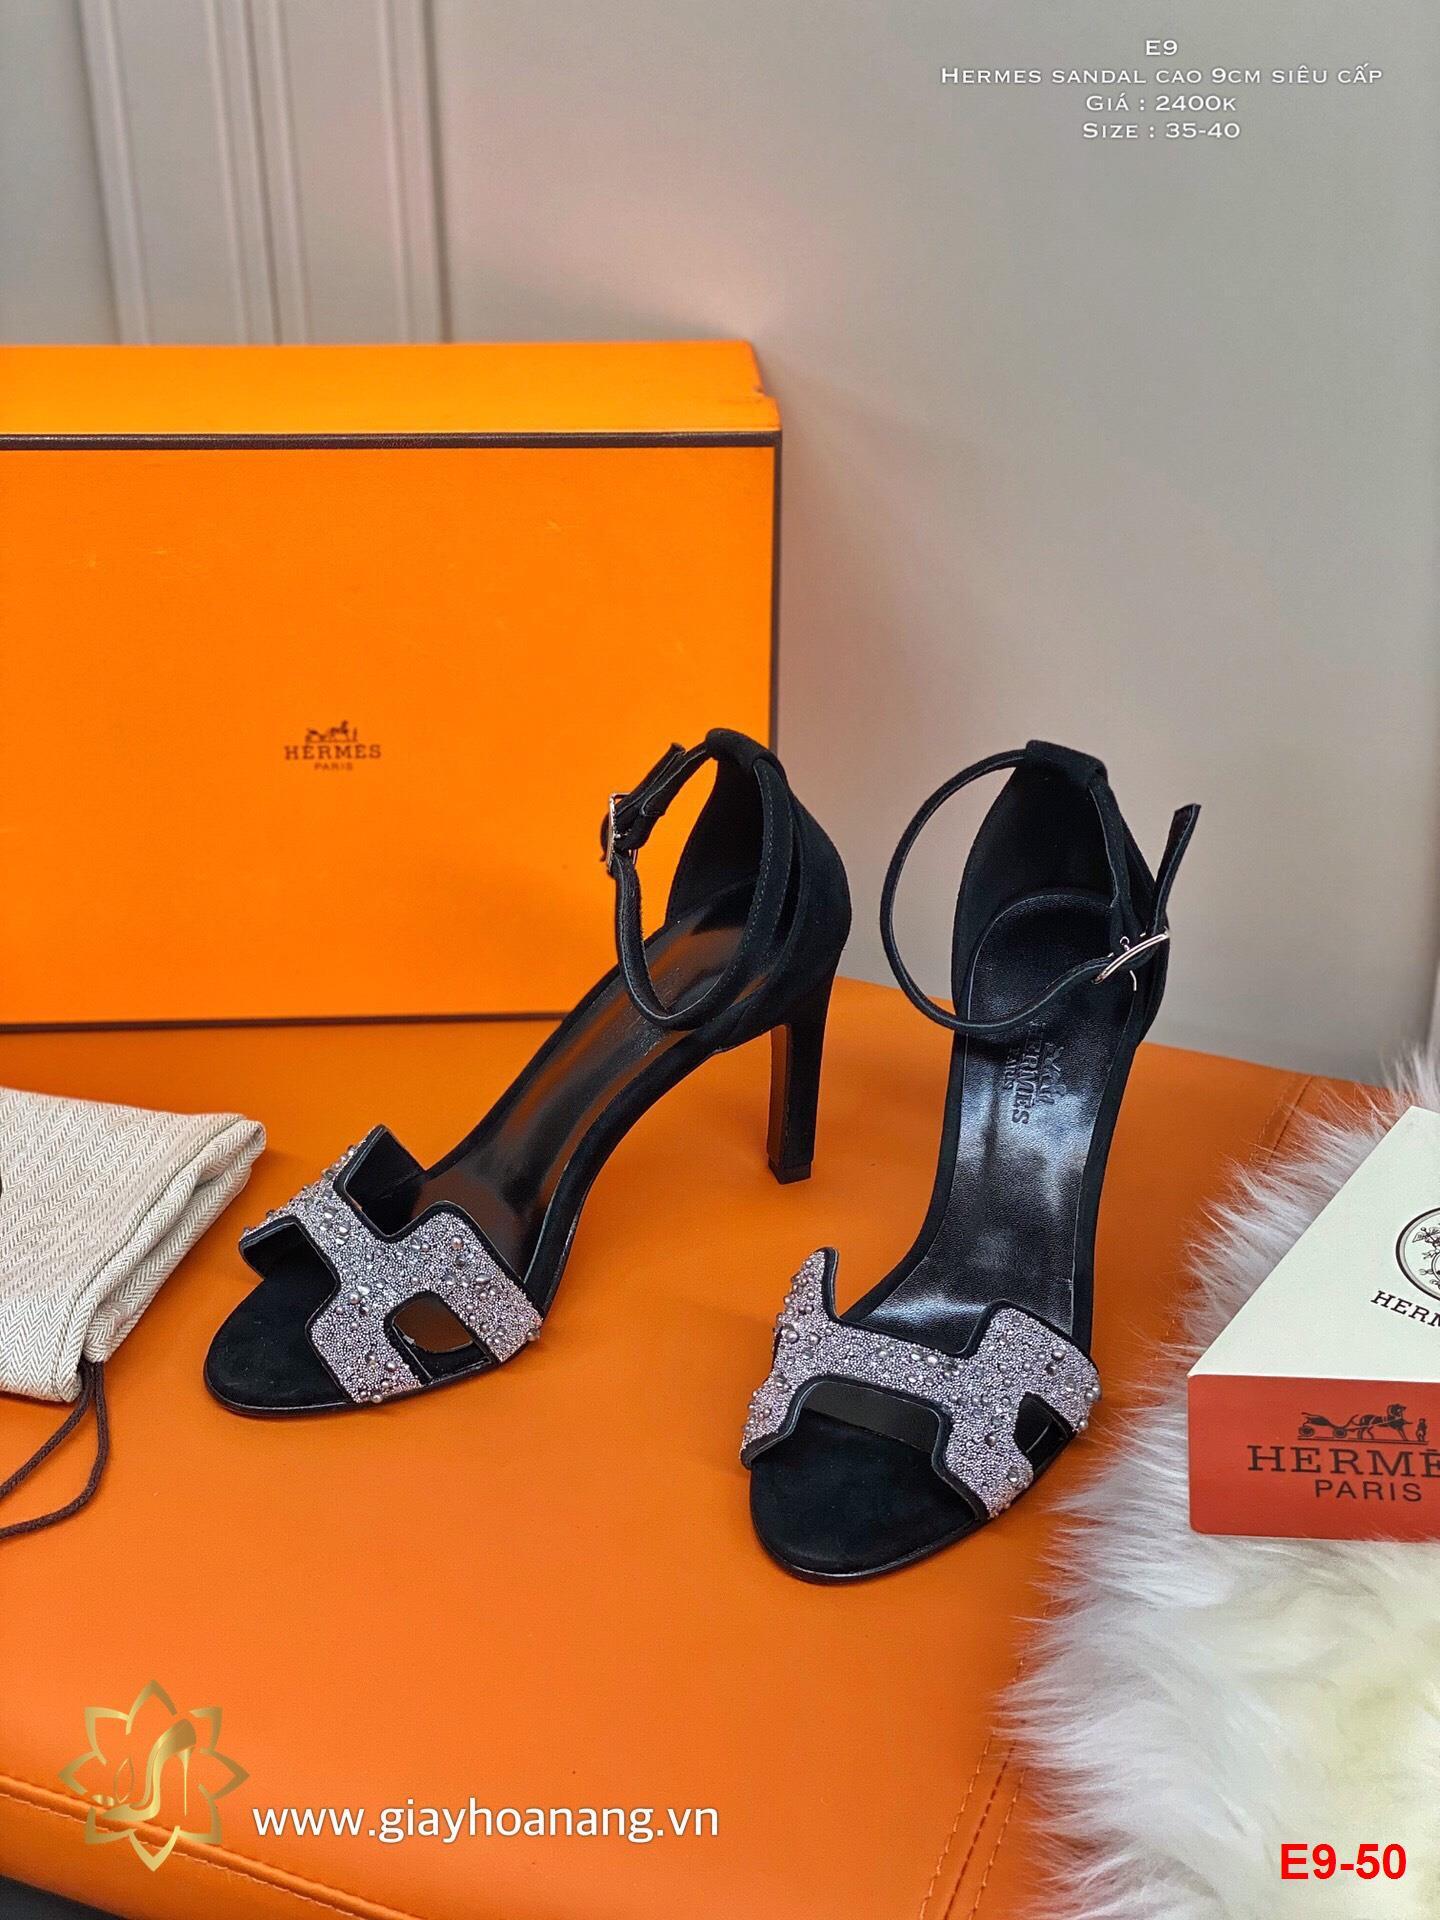 E9-50 Hermes sandal cao 9cm siêu cấp